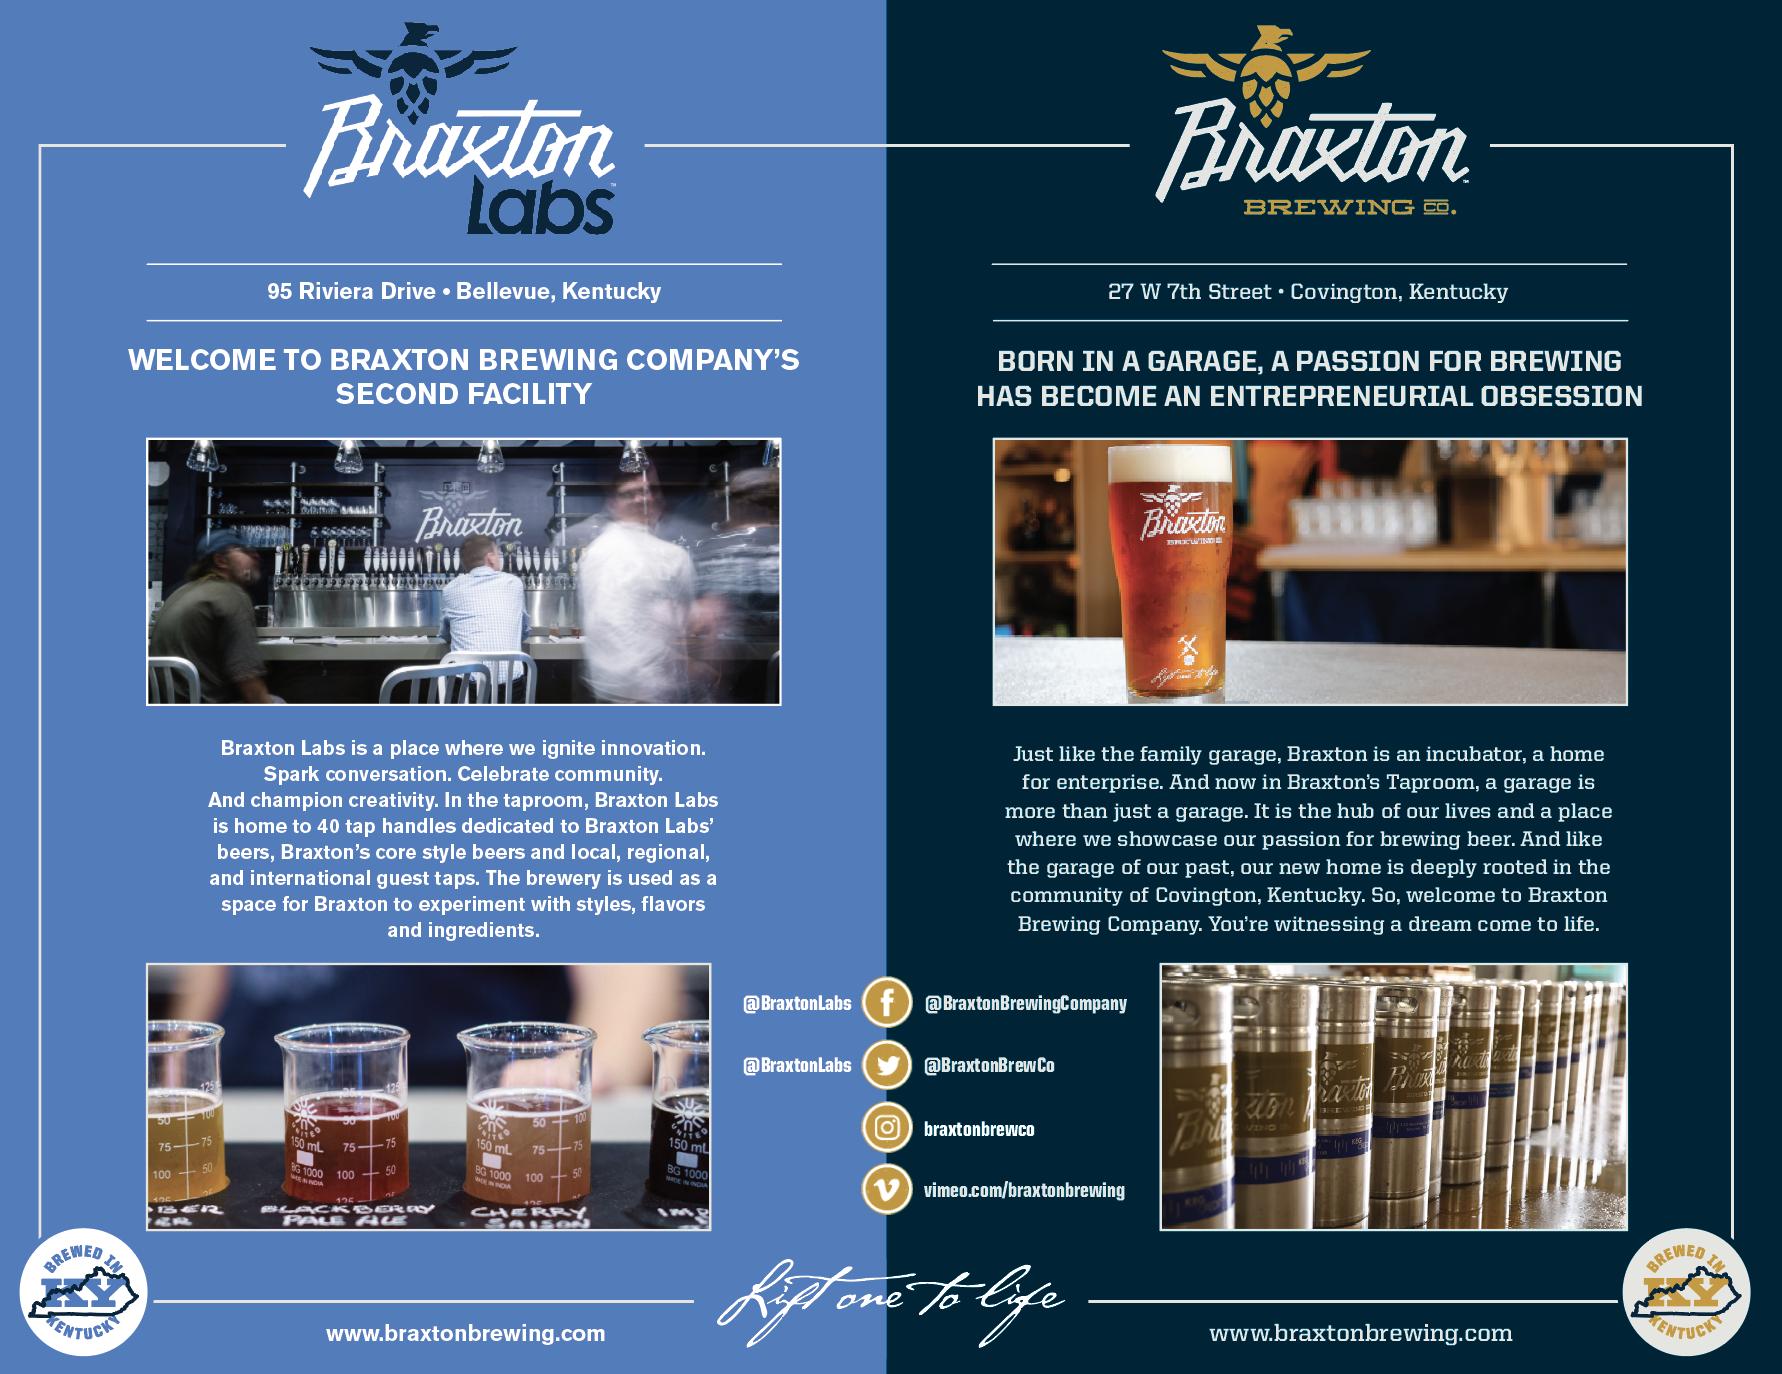 Braxton Brewing Co.